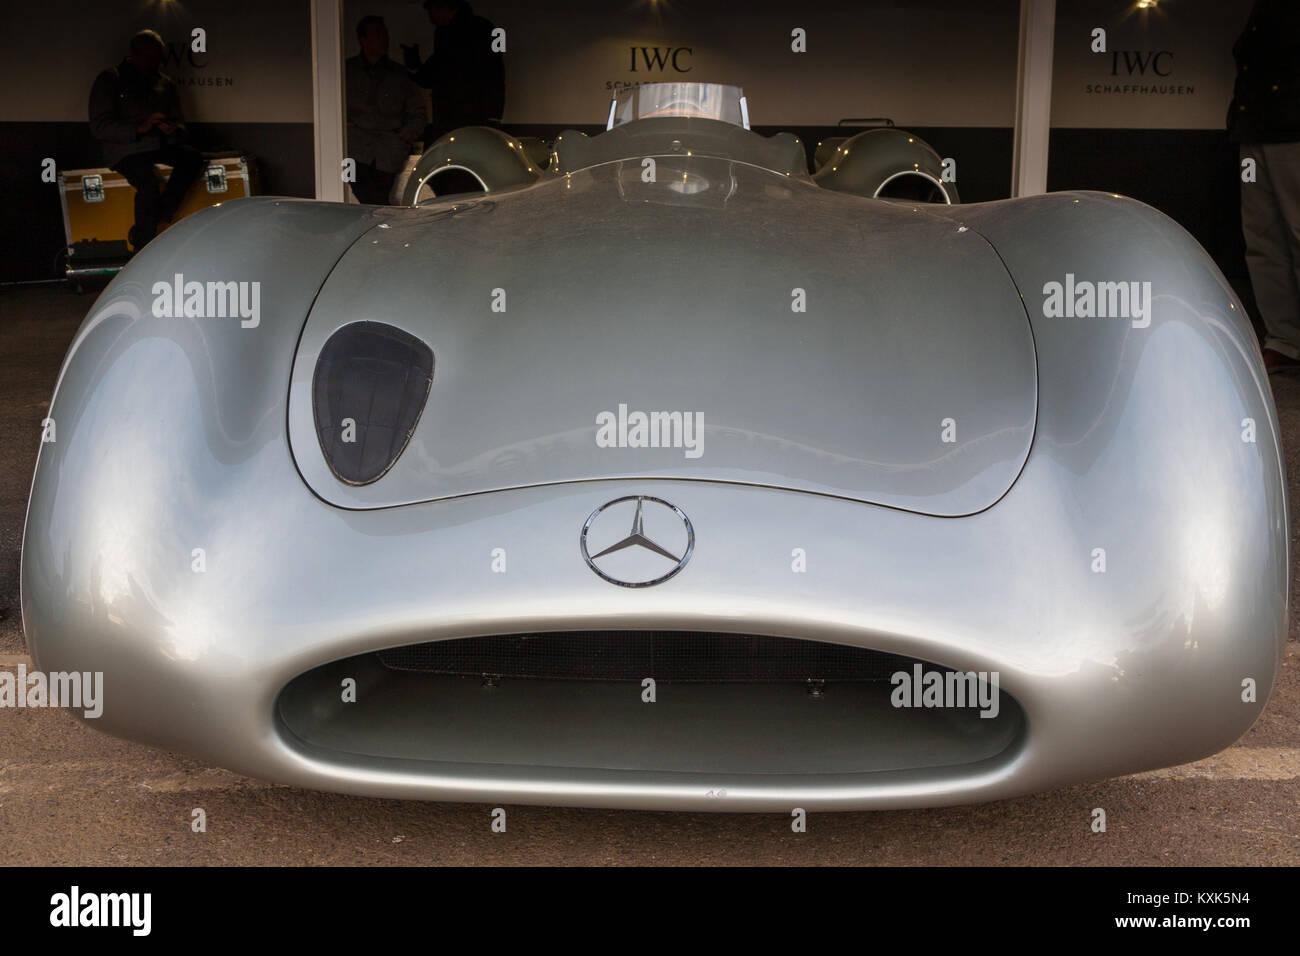 1954 Mercedes Benz Silver Arrow W196R Streamliner, GRRC 74th Members  Meeting, Goodwood, West